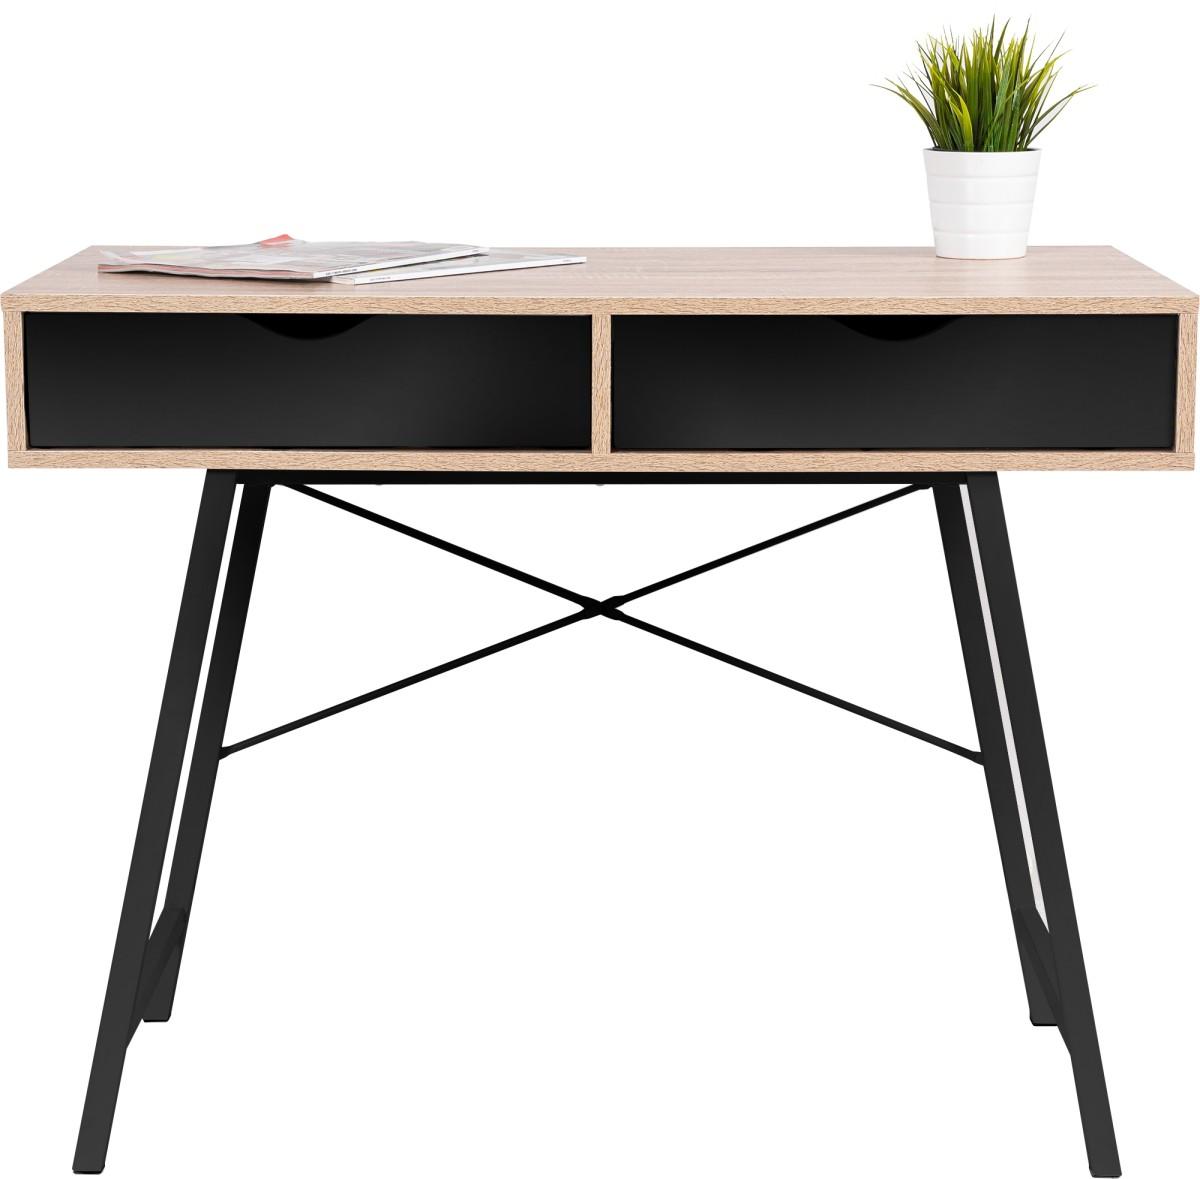 Písací stôl Loft drevo/čierny